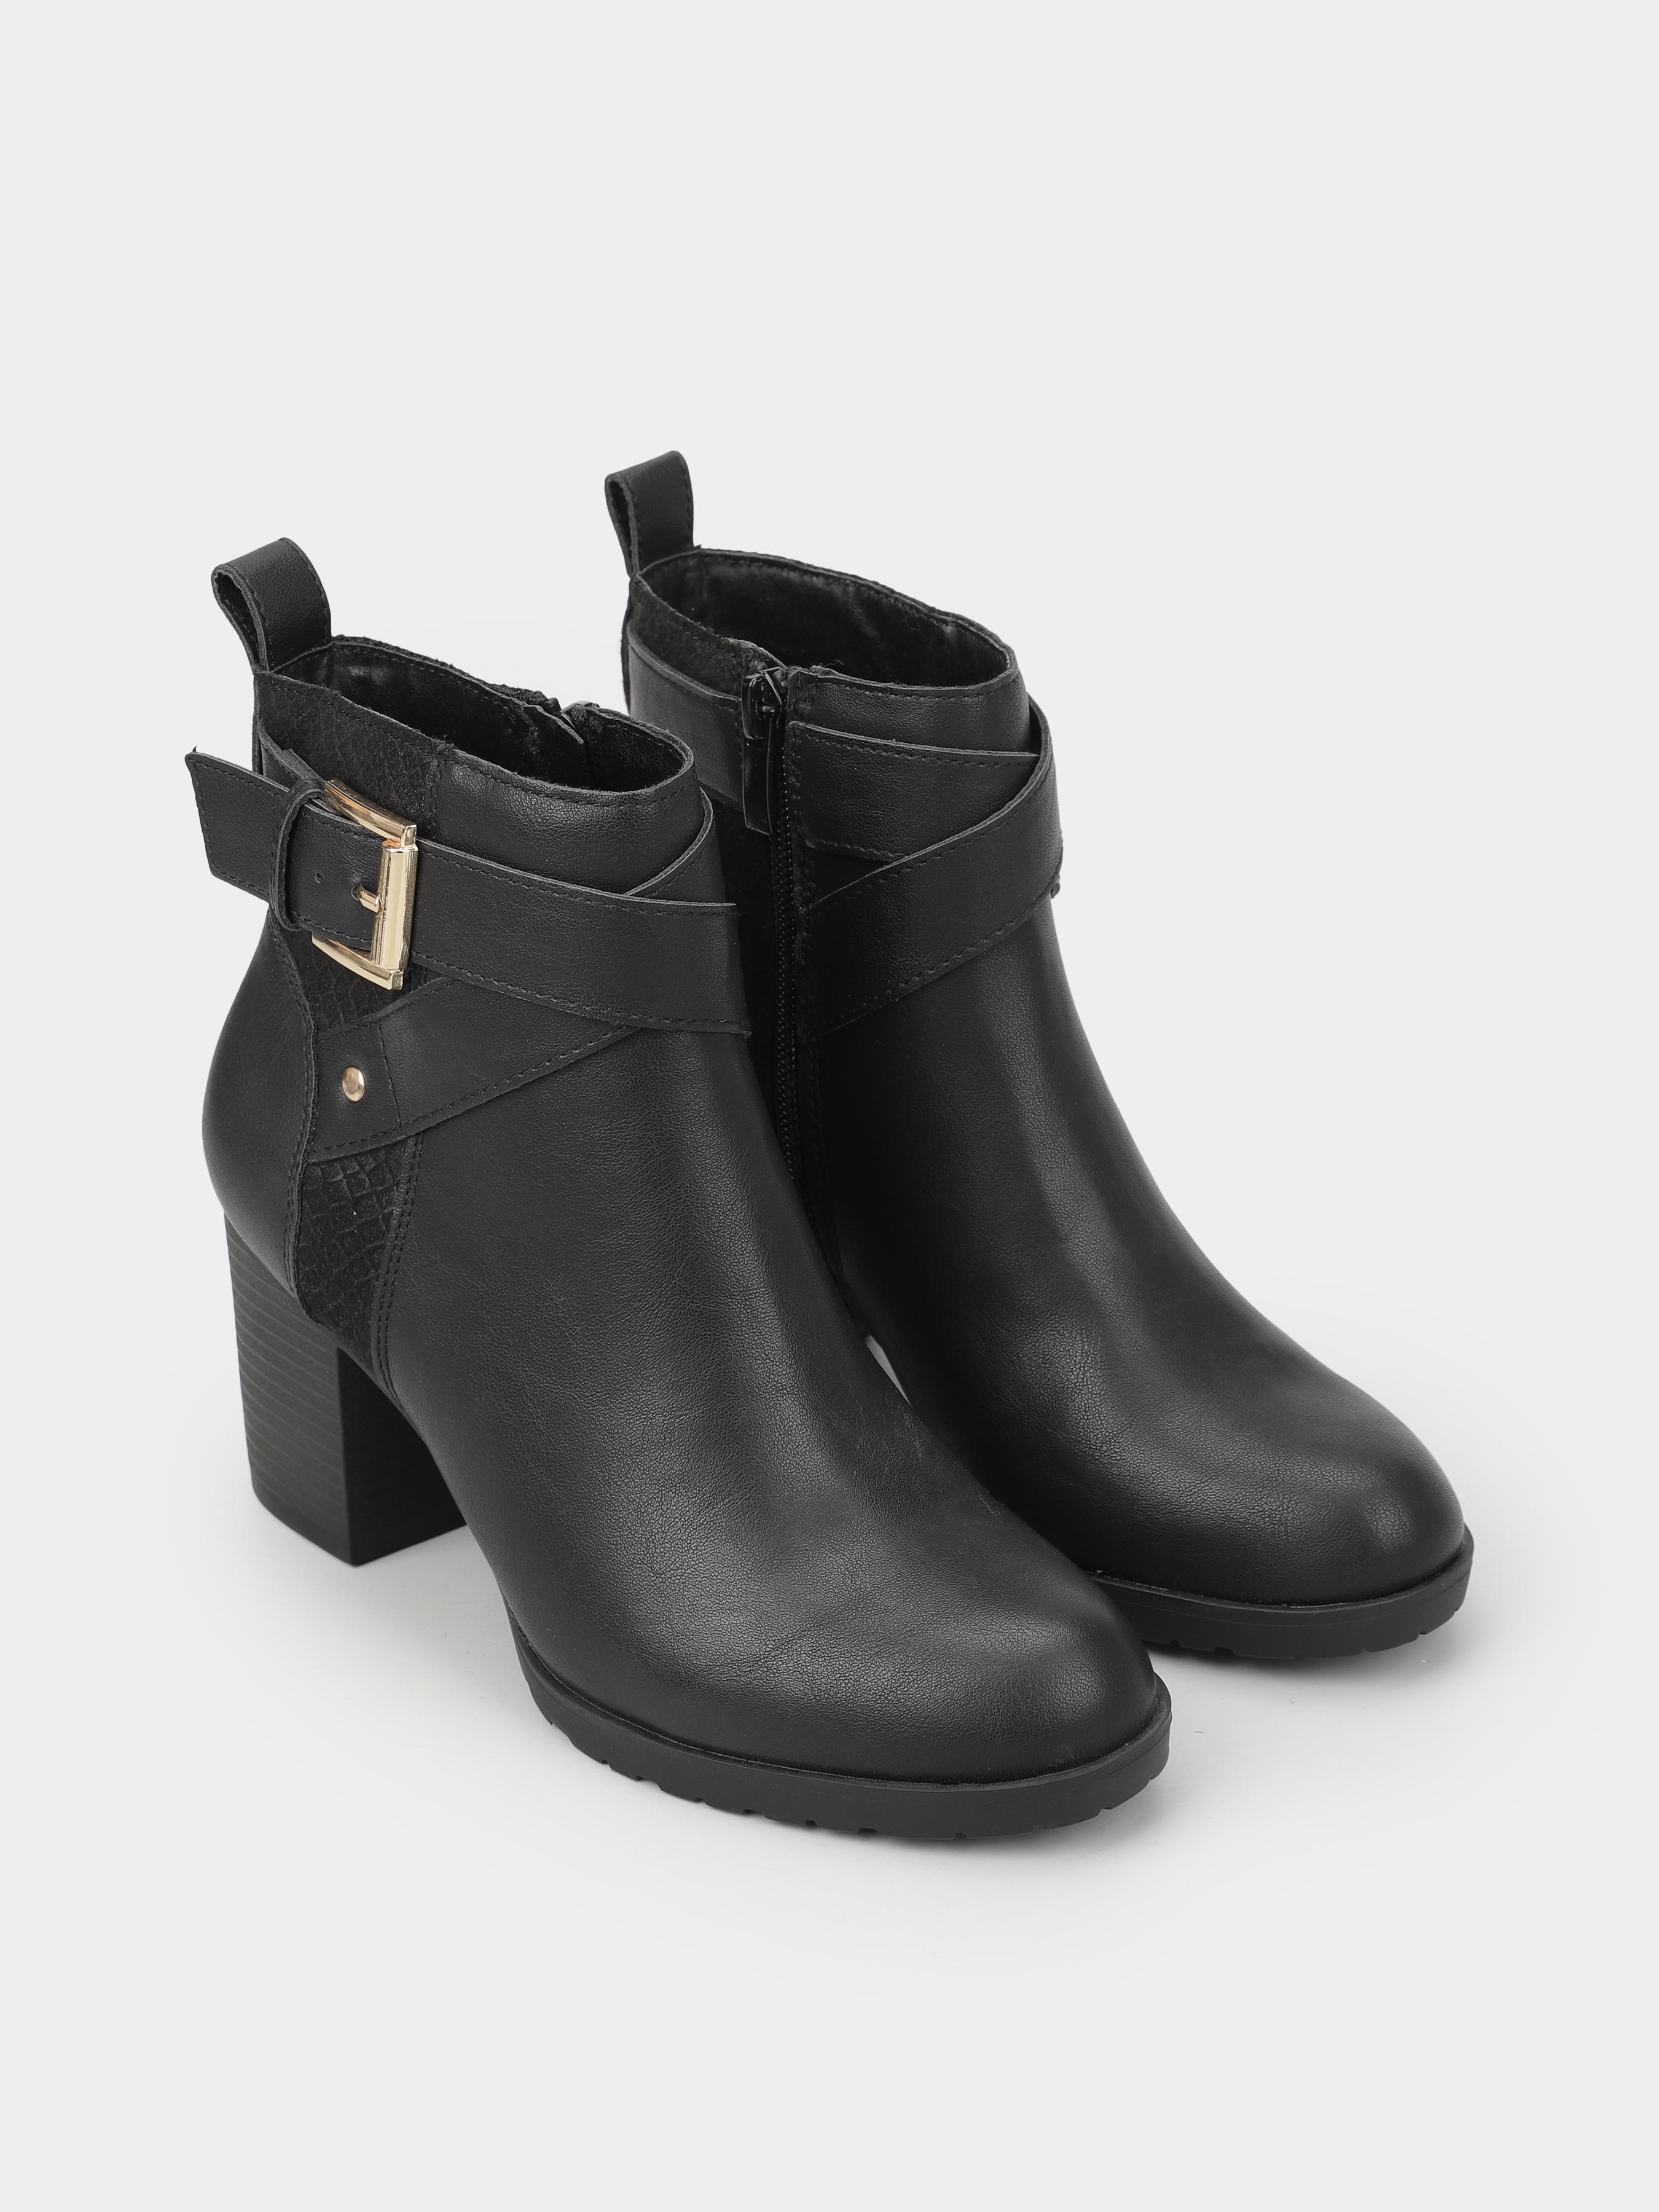 Ботинки для женщин M Wone OI153 размерная сетка обуви, 2017